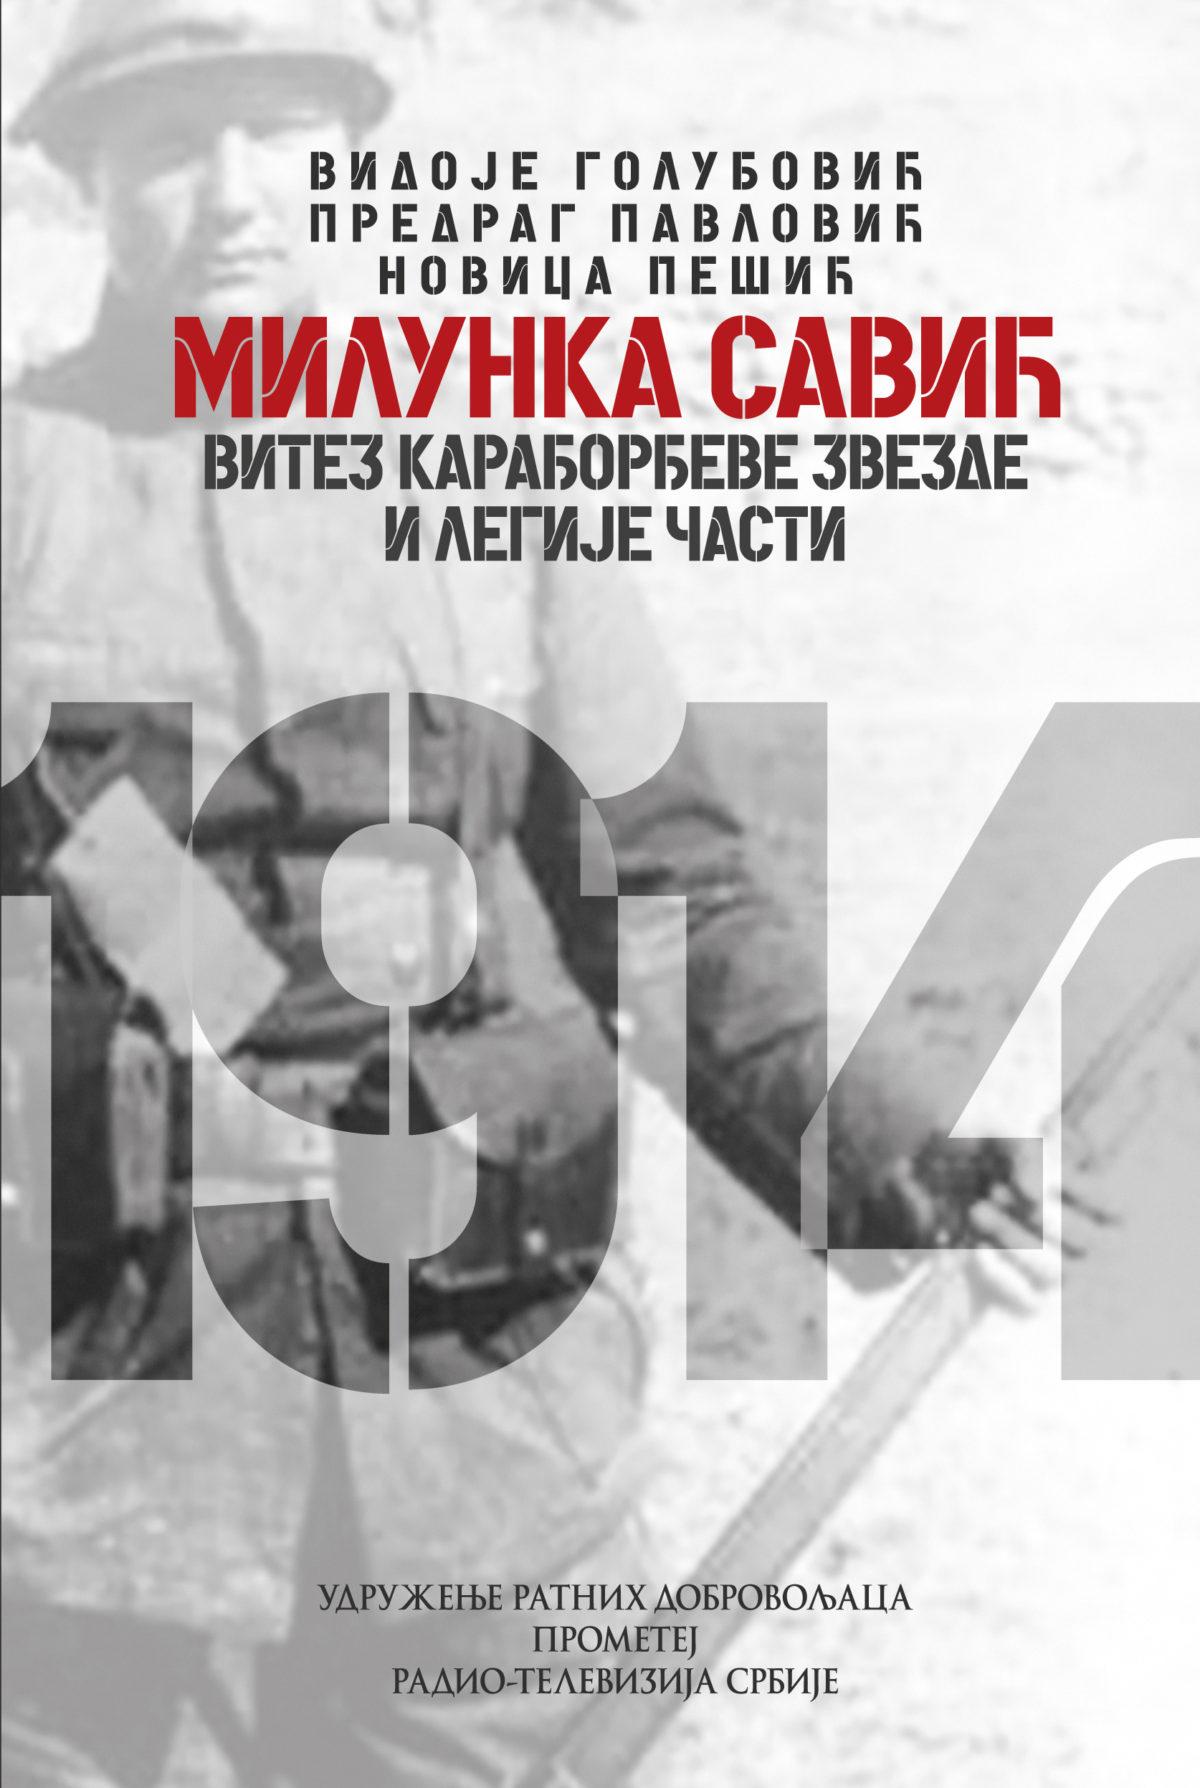 Milunka Savić : Vitez Karađorđeve zvezde i Legije časti